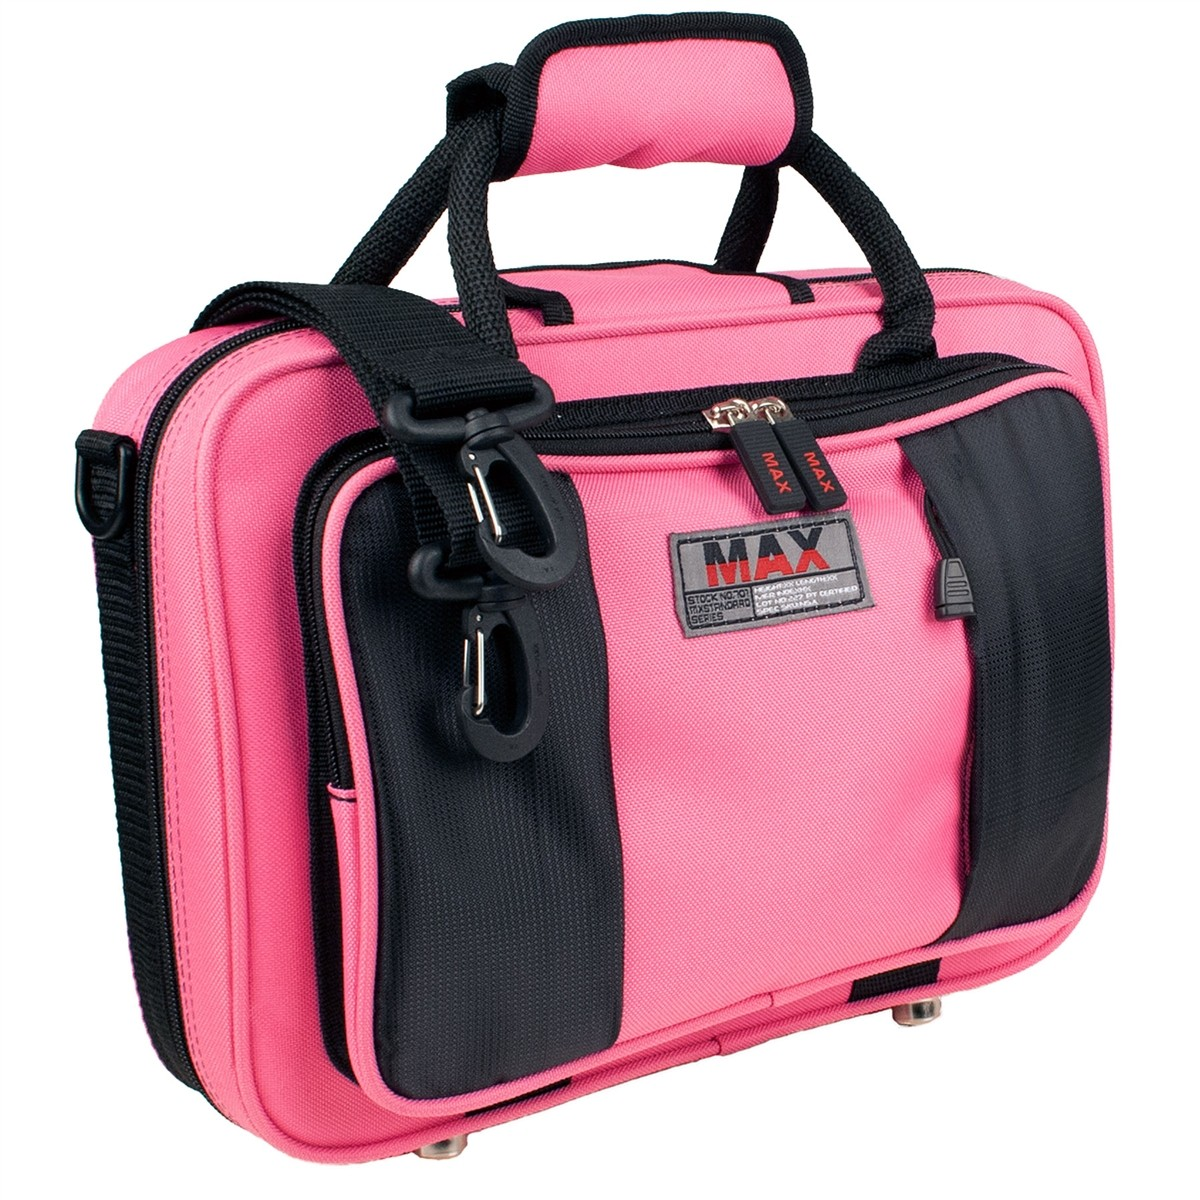 Protec Bb Clarinet MAX Case (Fuchsia/Pink MX307FX)